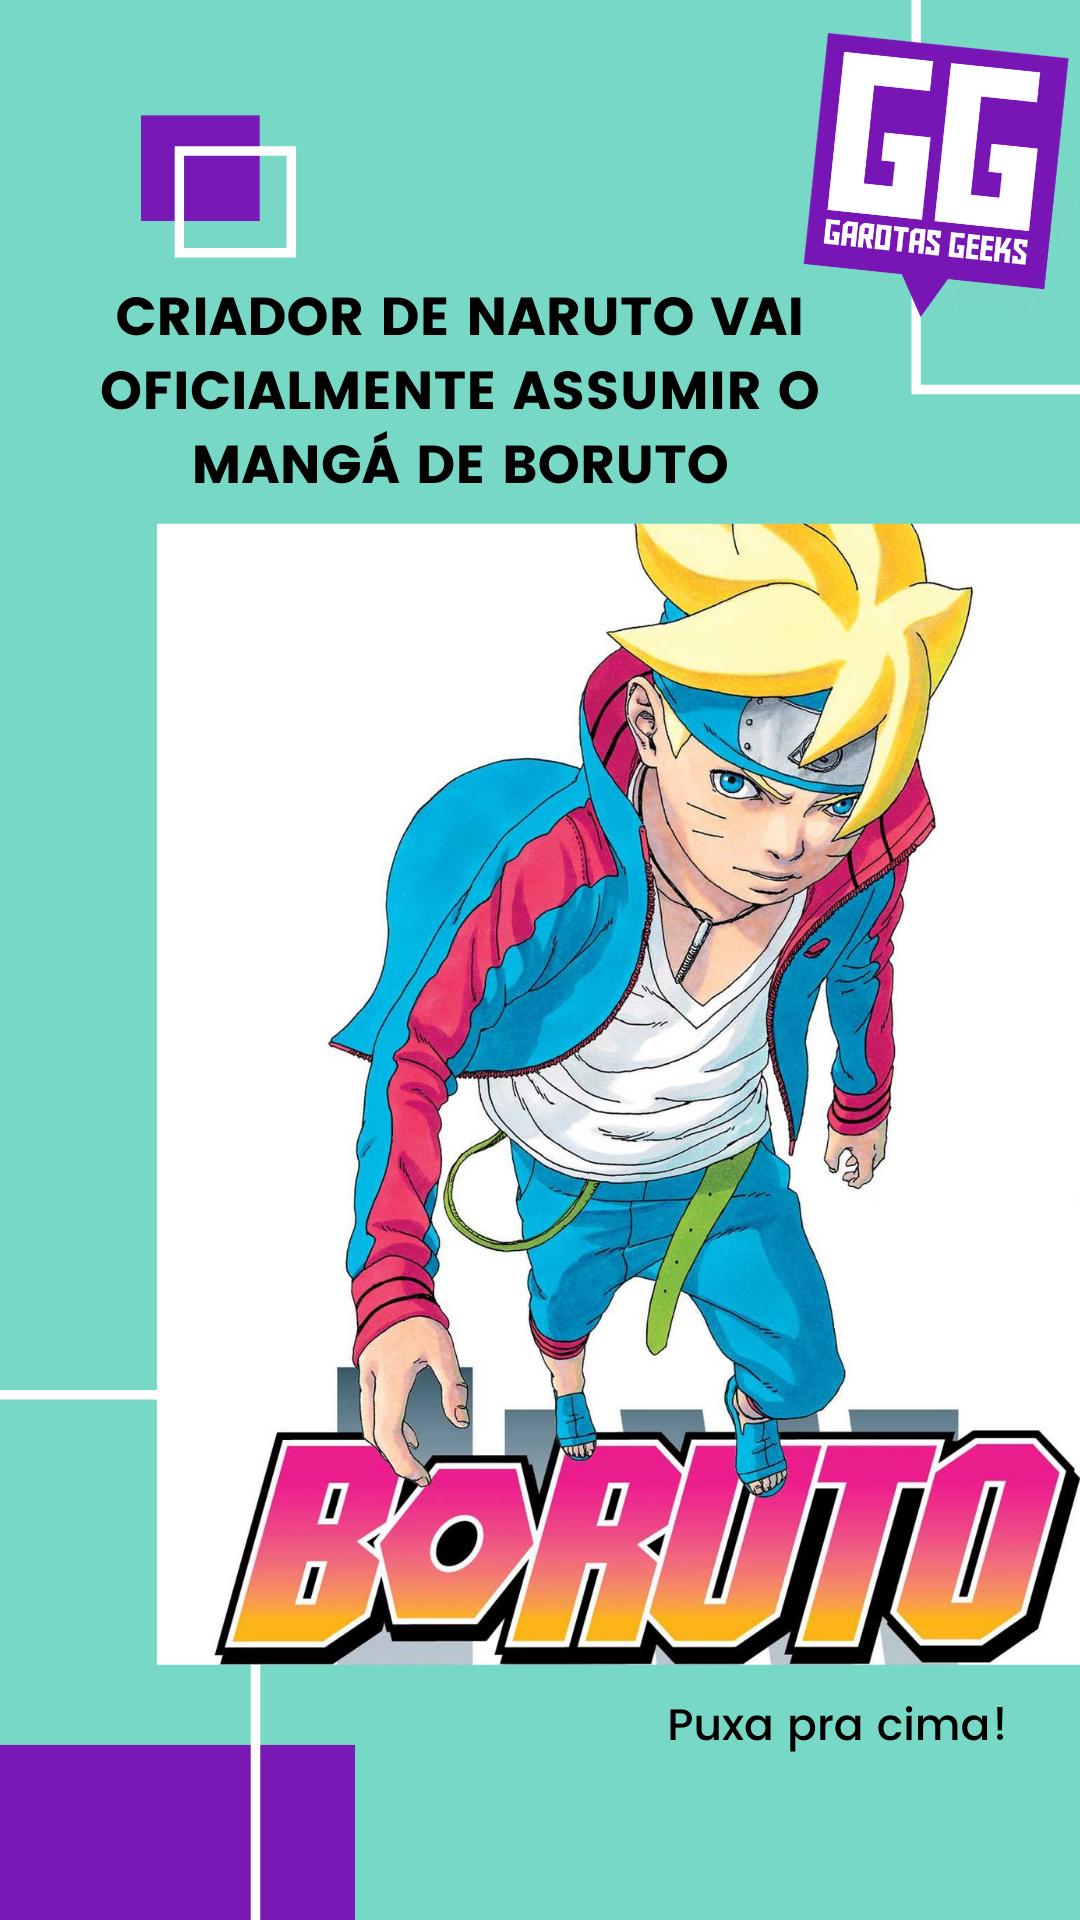 Criador De Naruto Vai Oficialmente Assumir O Manga De Boruto Manga De Boruto Boruto Naruto